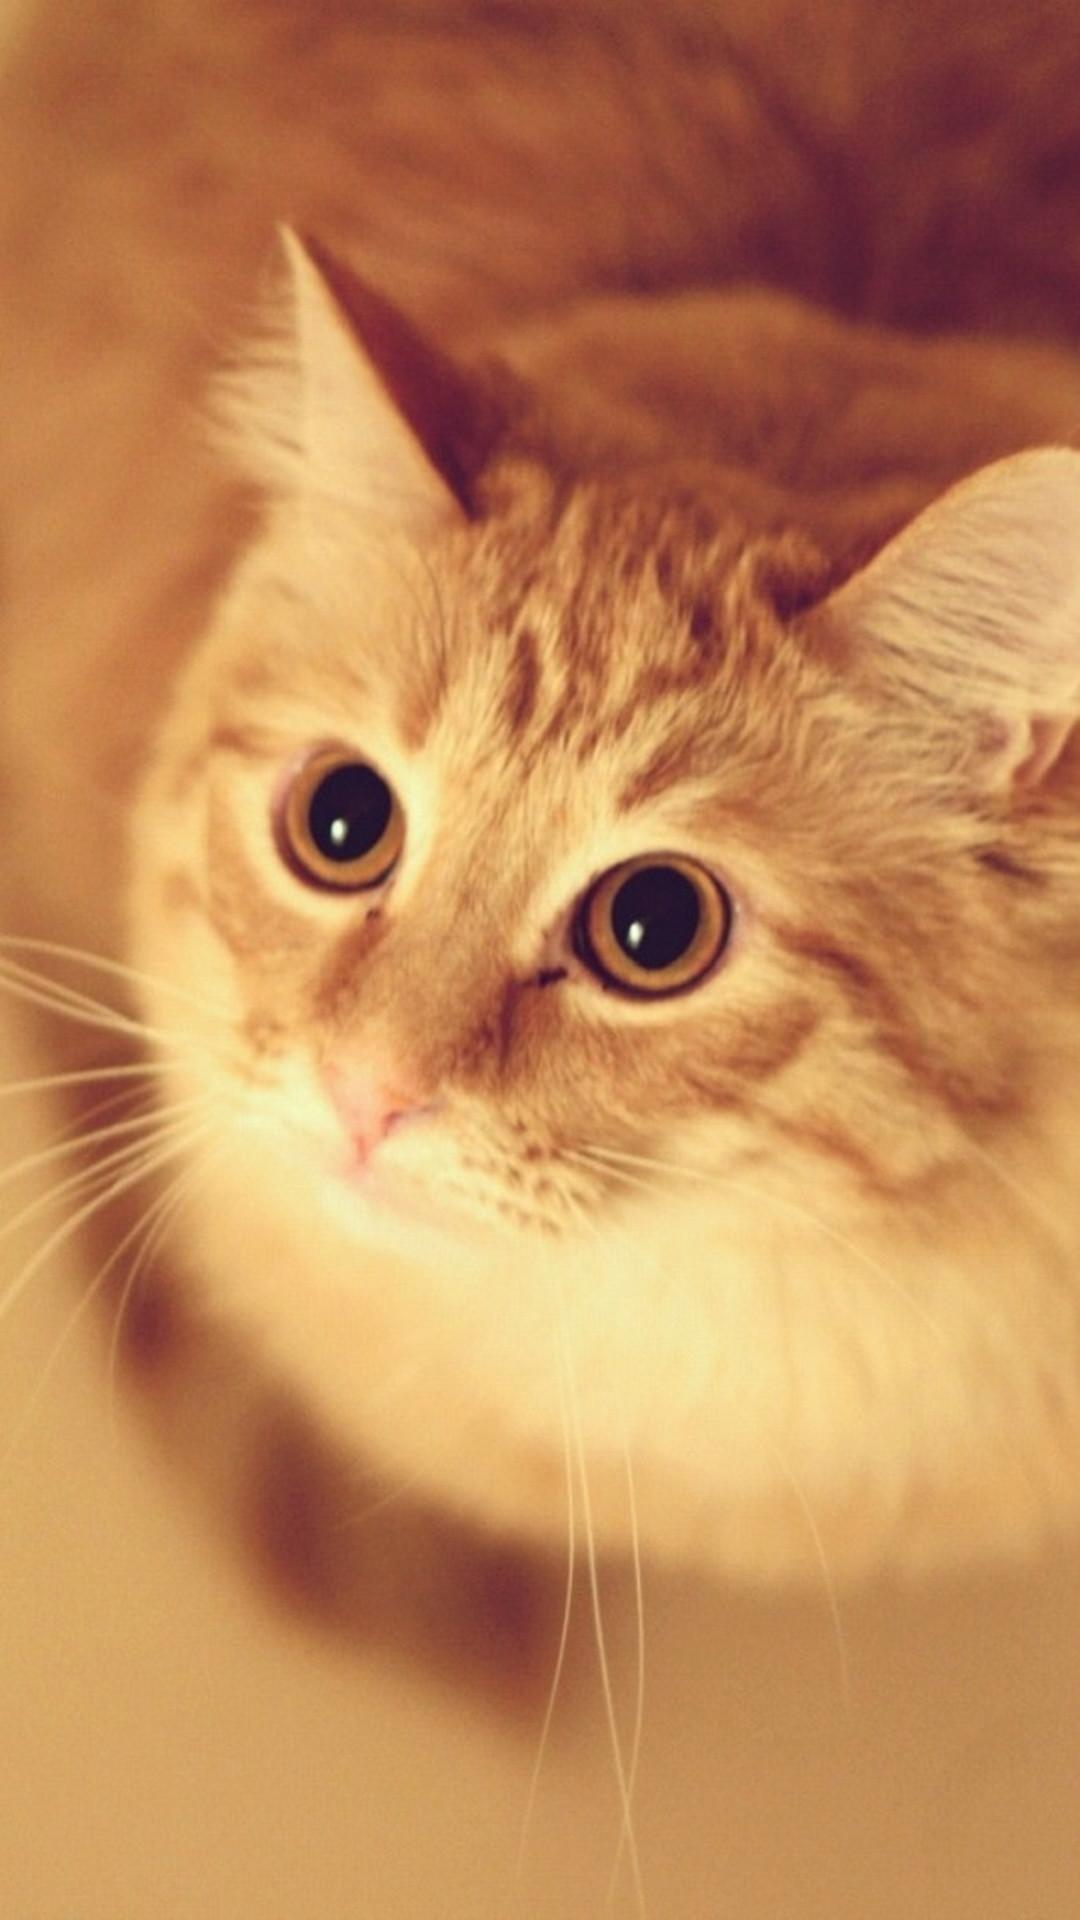 Cute Pet Kitten Cat Animal Blur iPhone 6 wallpaper